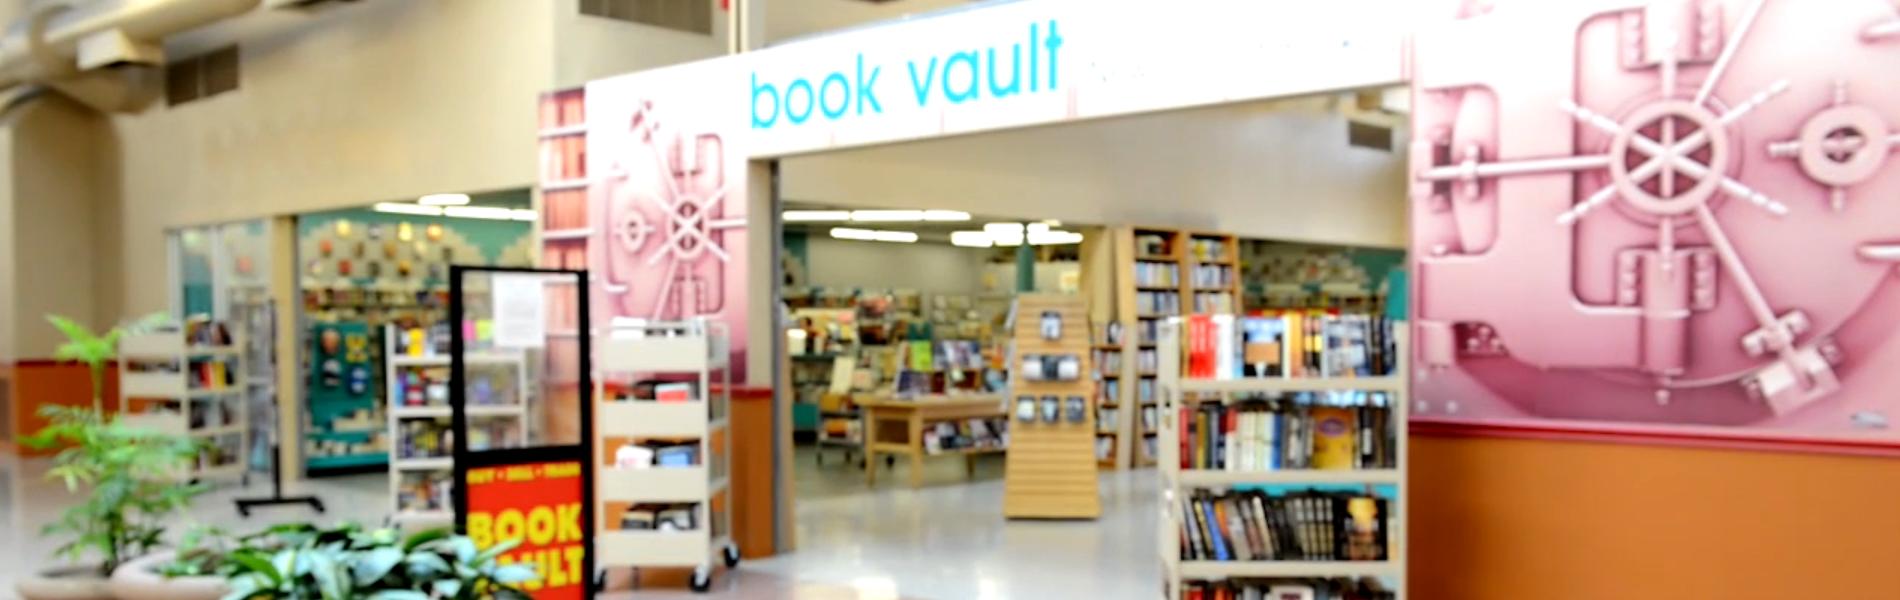 book vault slide